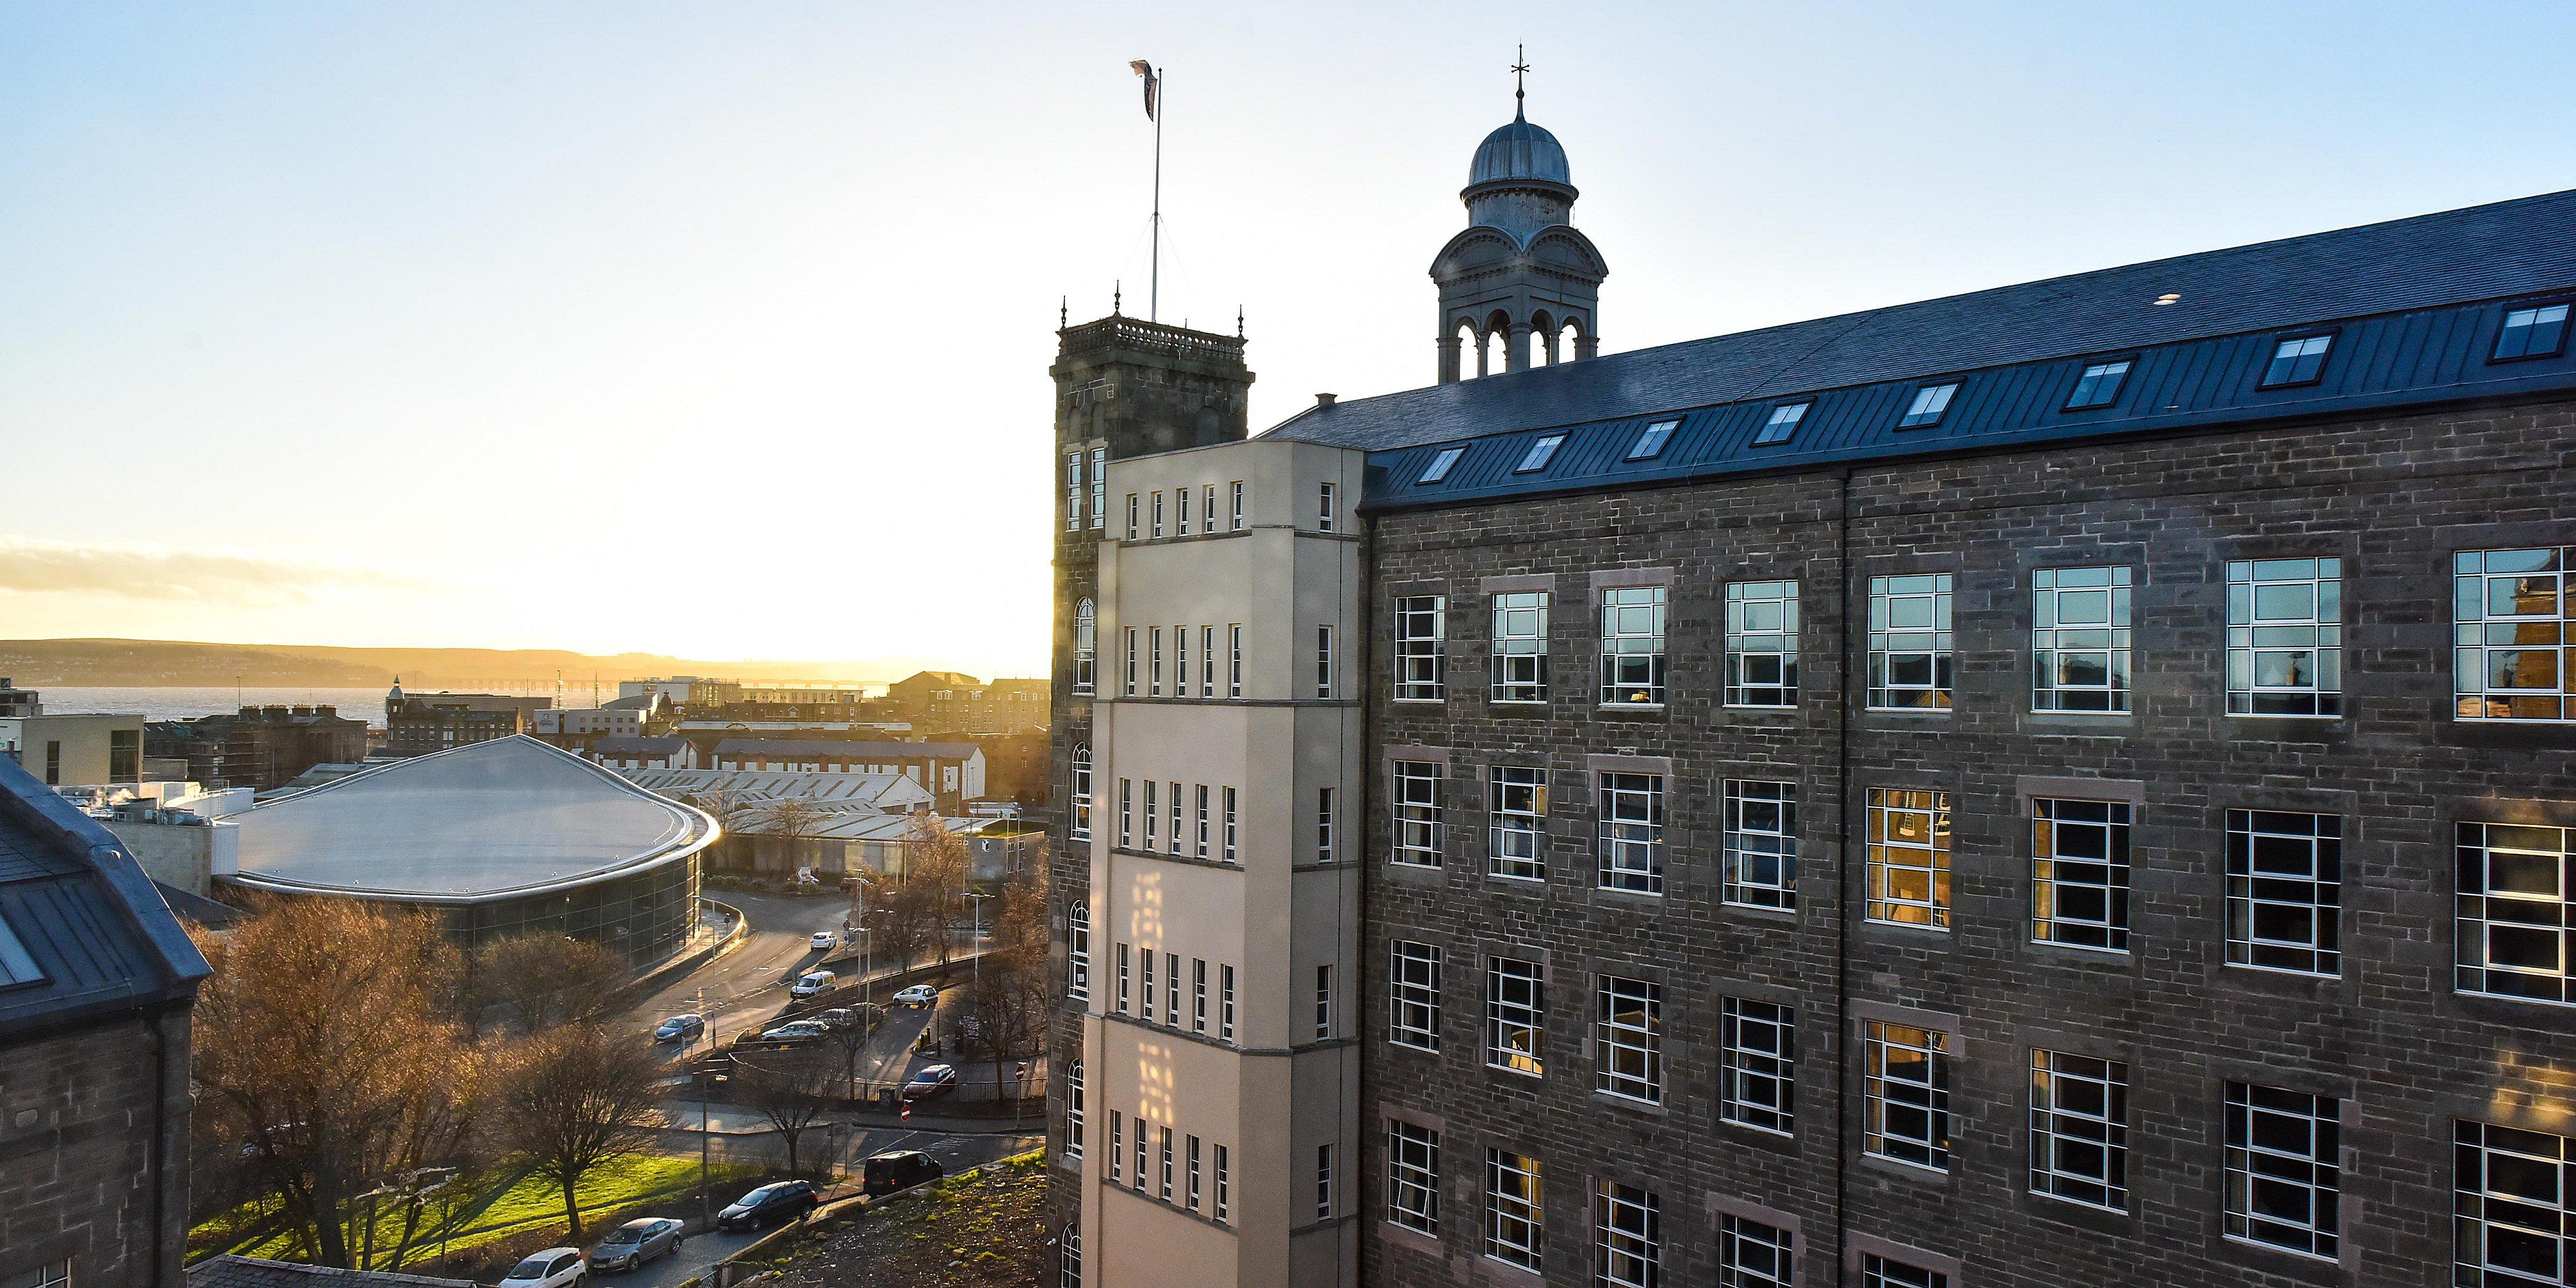 Staybridge Suites Dundee Dundee United Kingdom